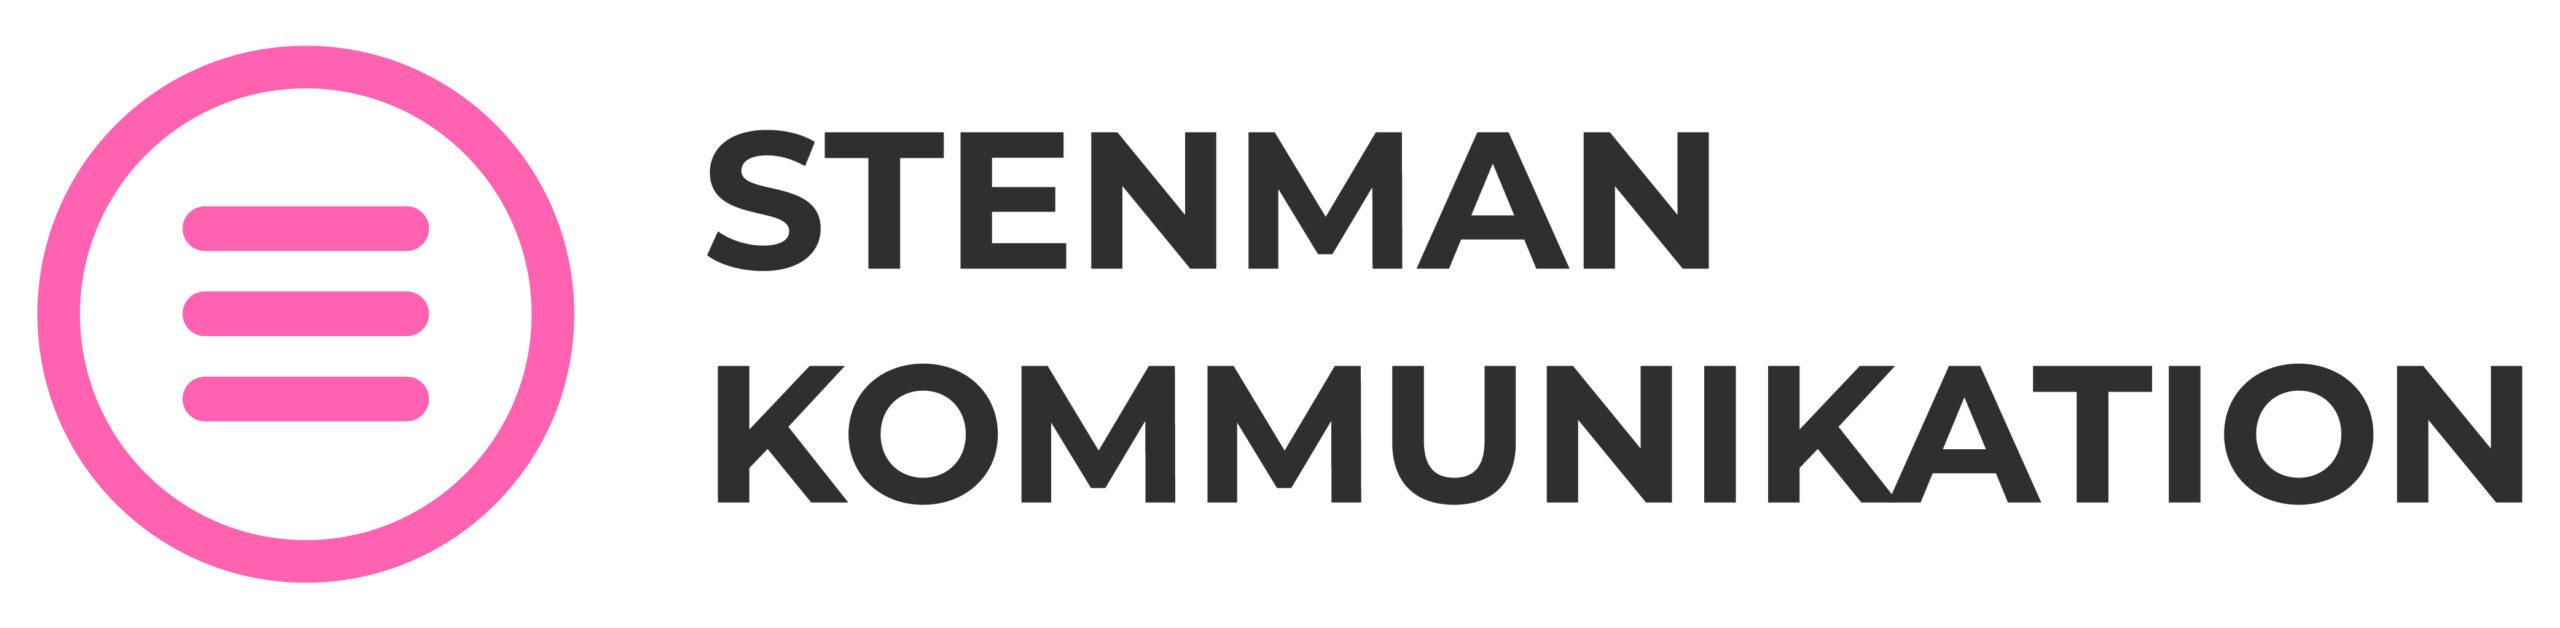 Logotyp Stenman kommunikation